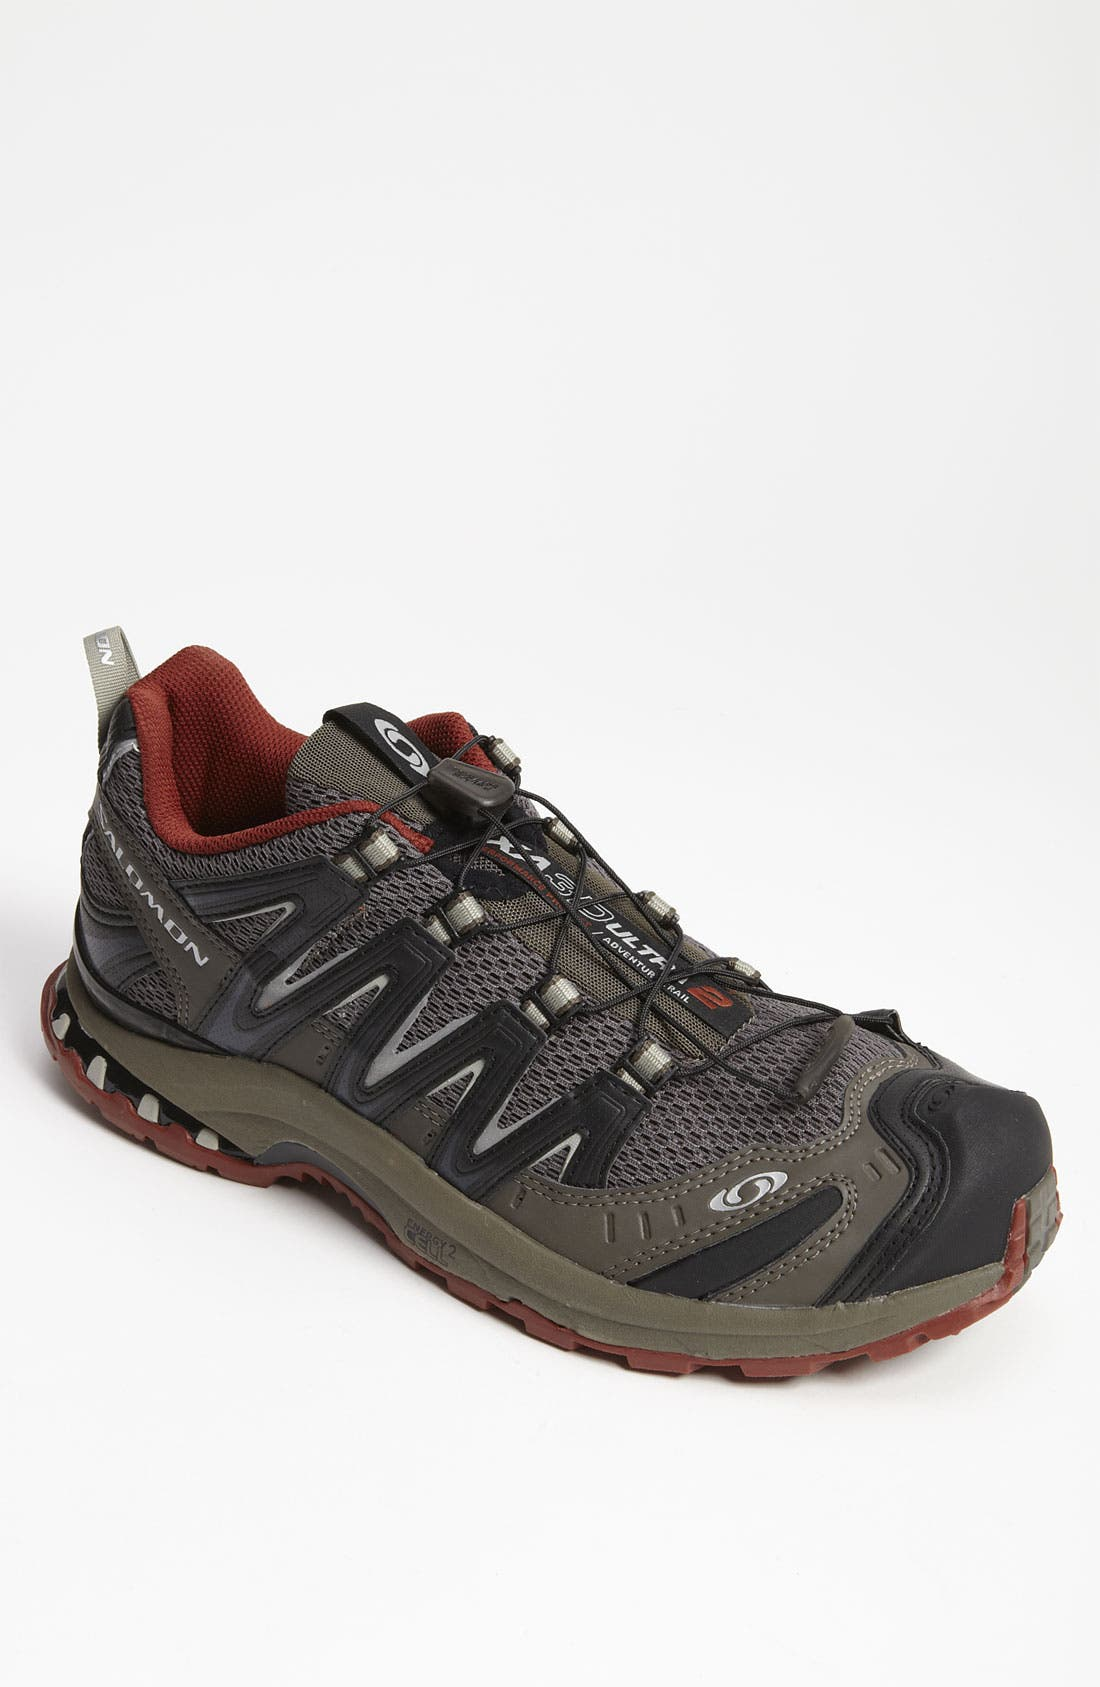 Main Image - Salomon 'XA Pro 3D' Running Shoe (Men)